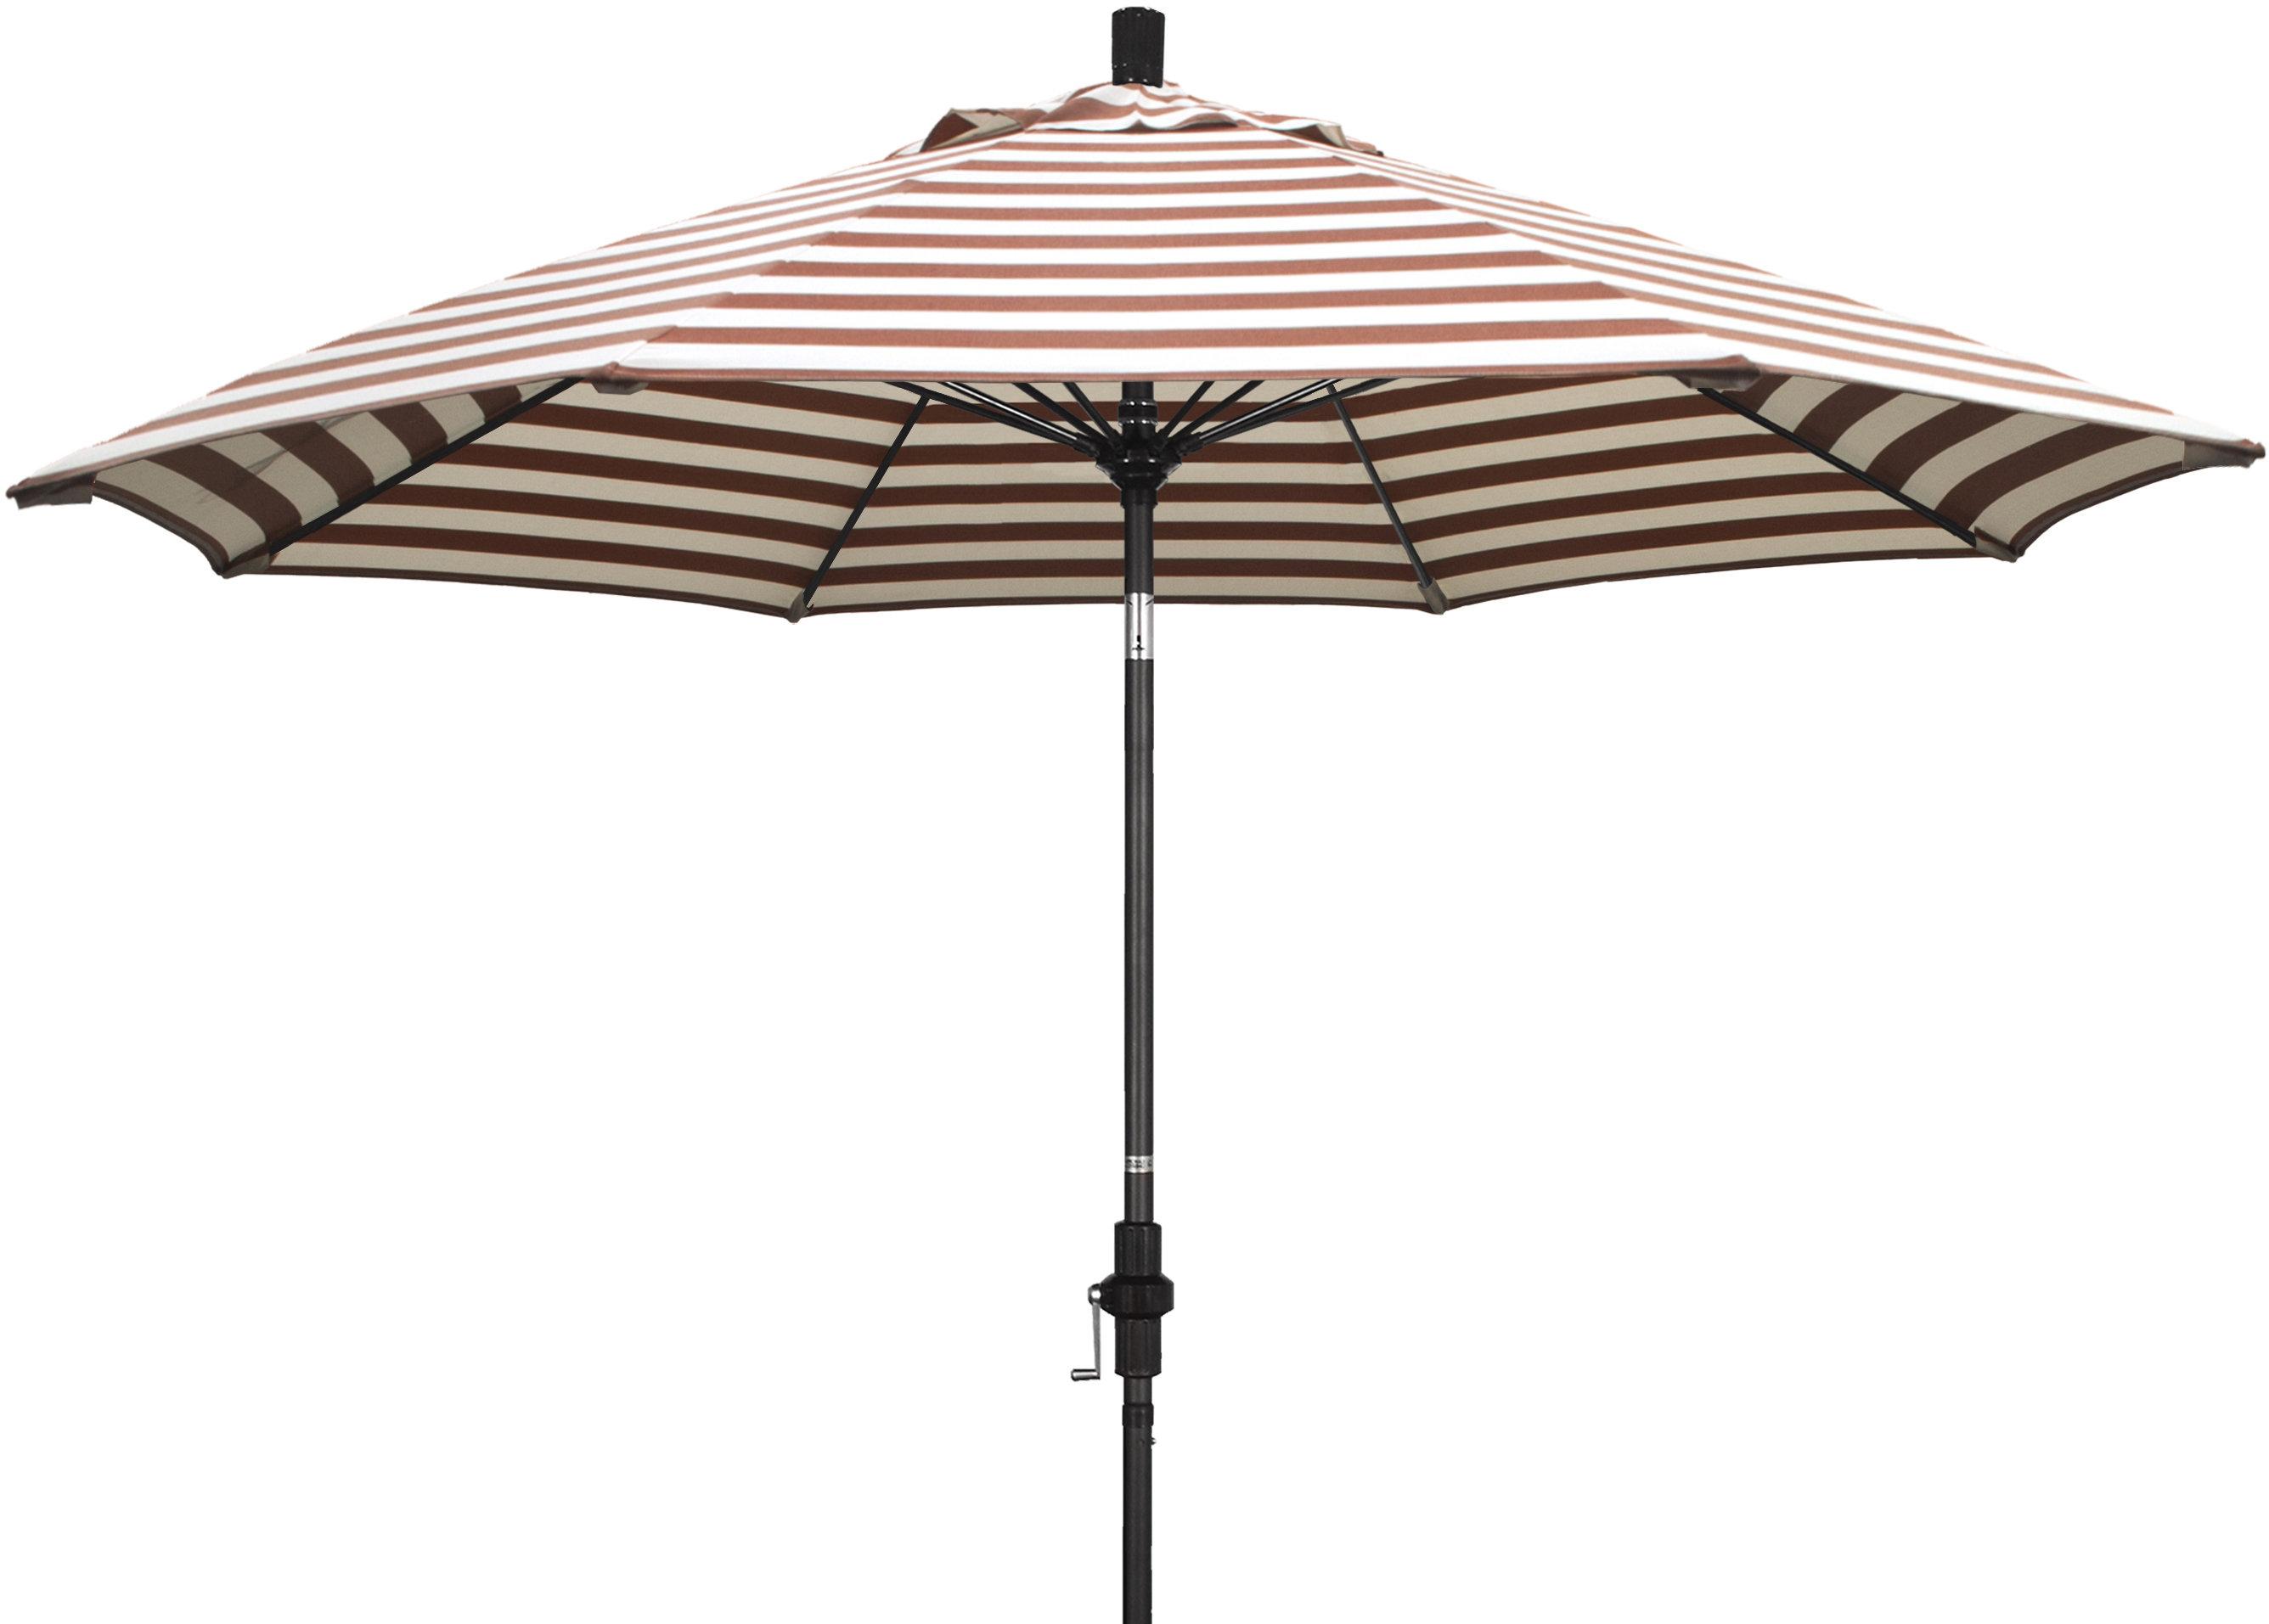 Aldan Market Umbrellas Within Best And Newest 9' Market Umbrella (View 6 of 20)